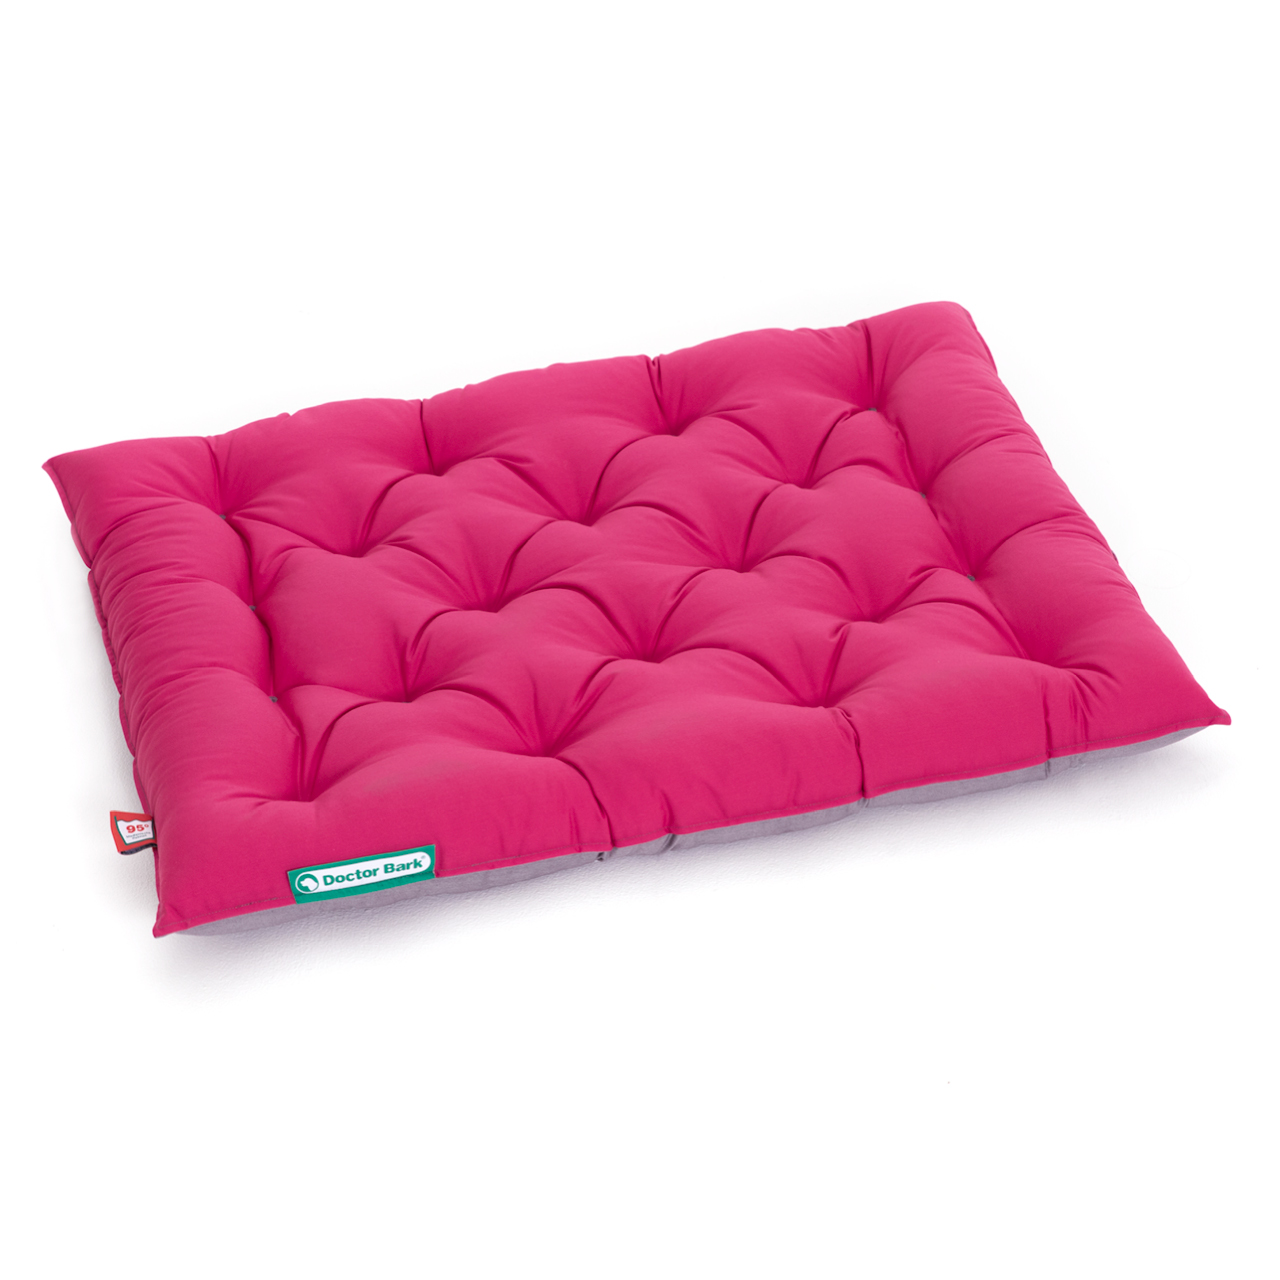 Hundekissen URBAN platingrau - hot pink L